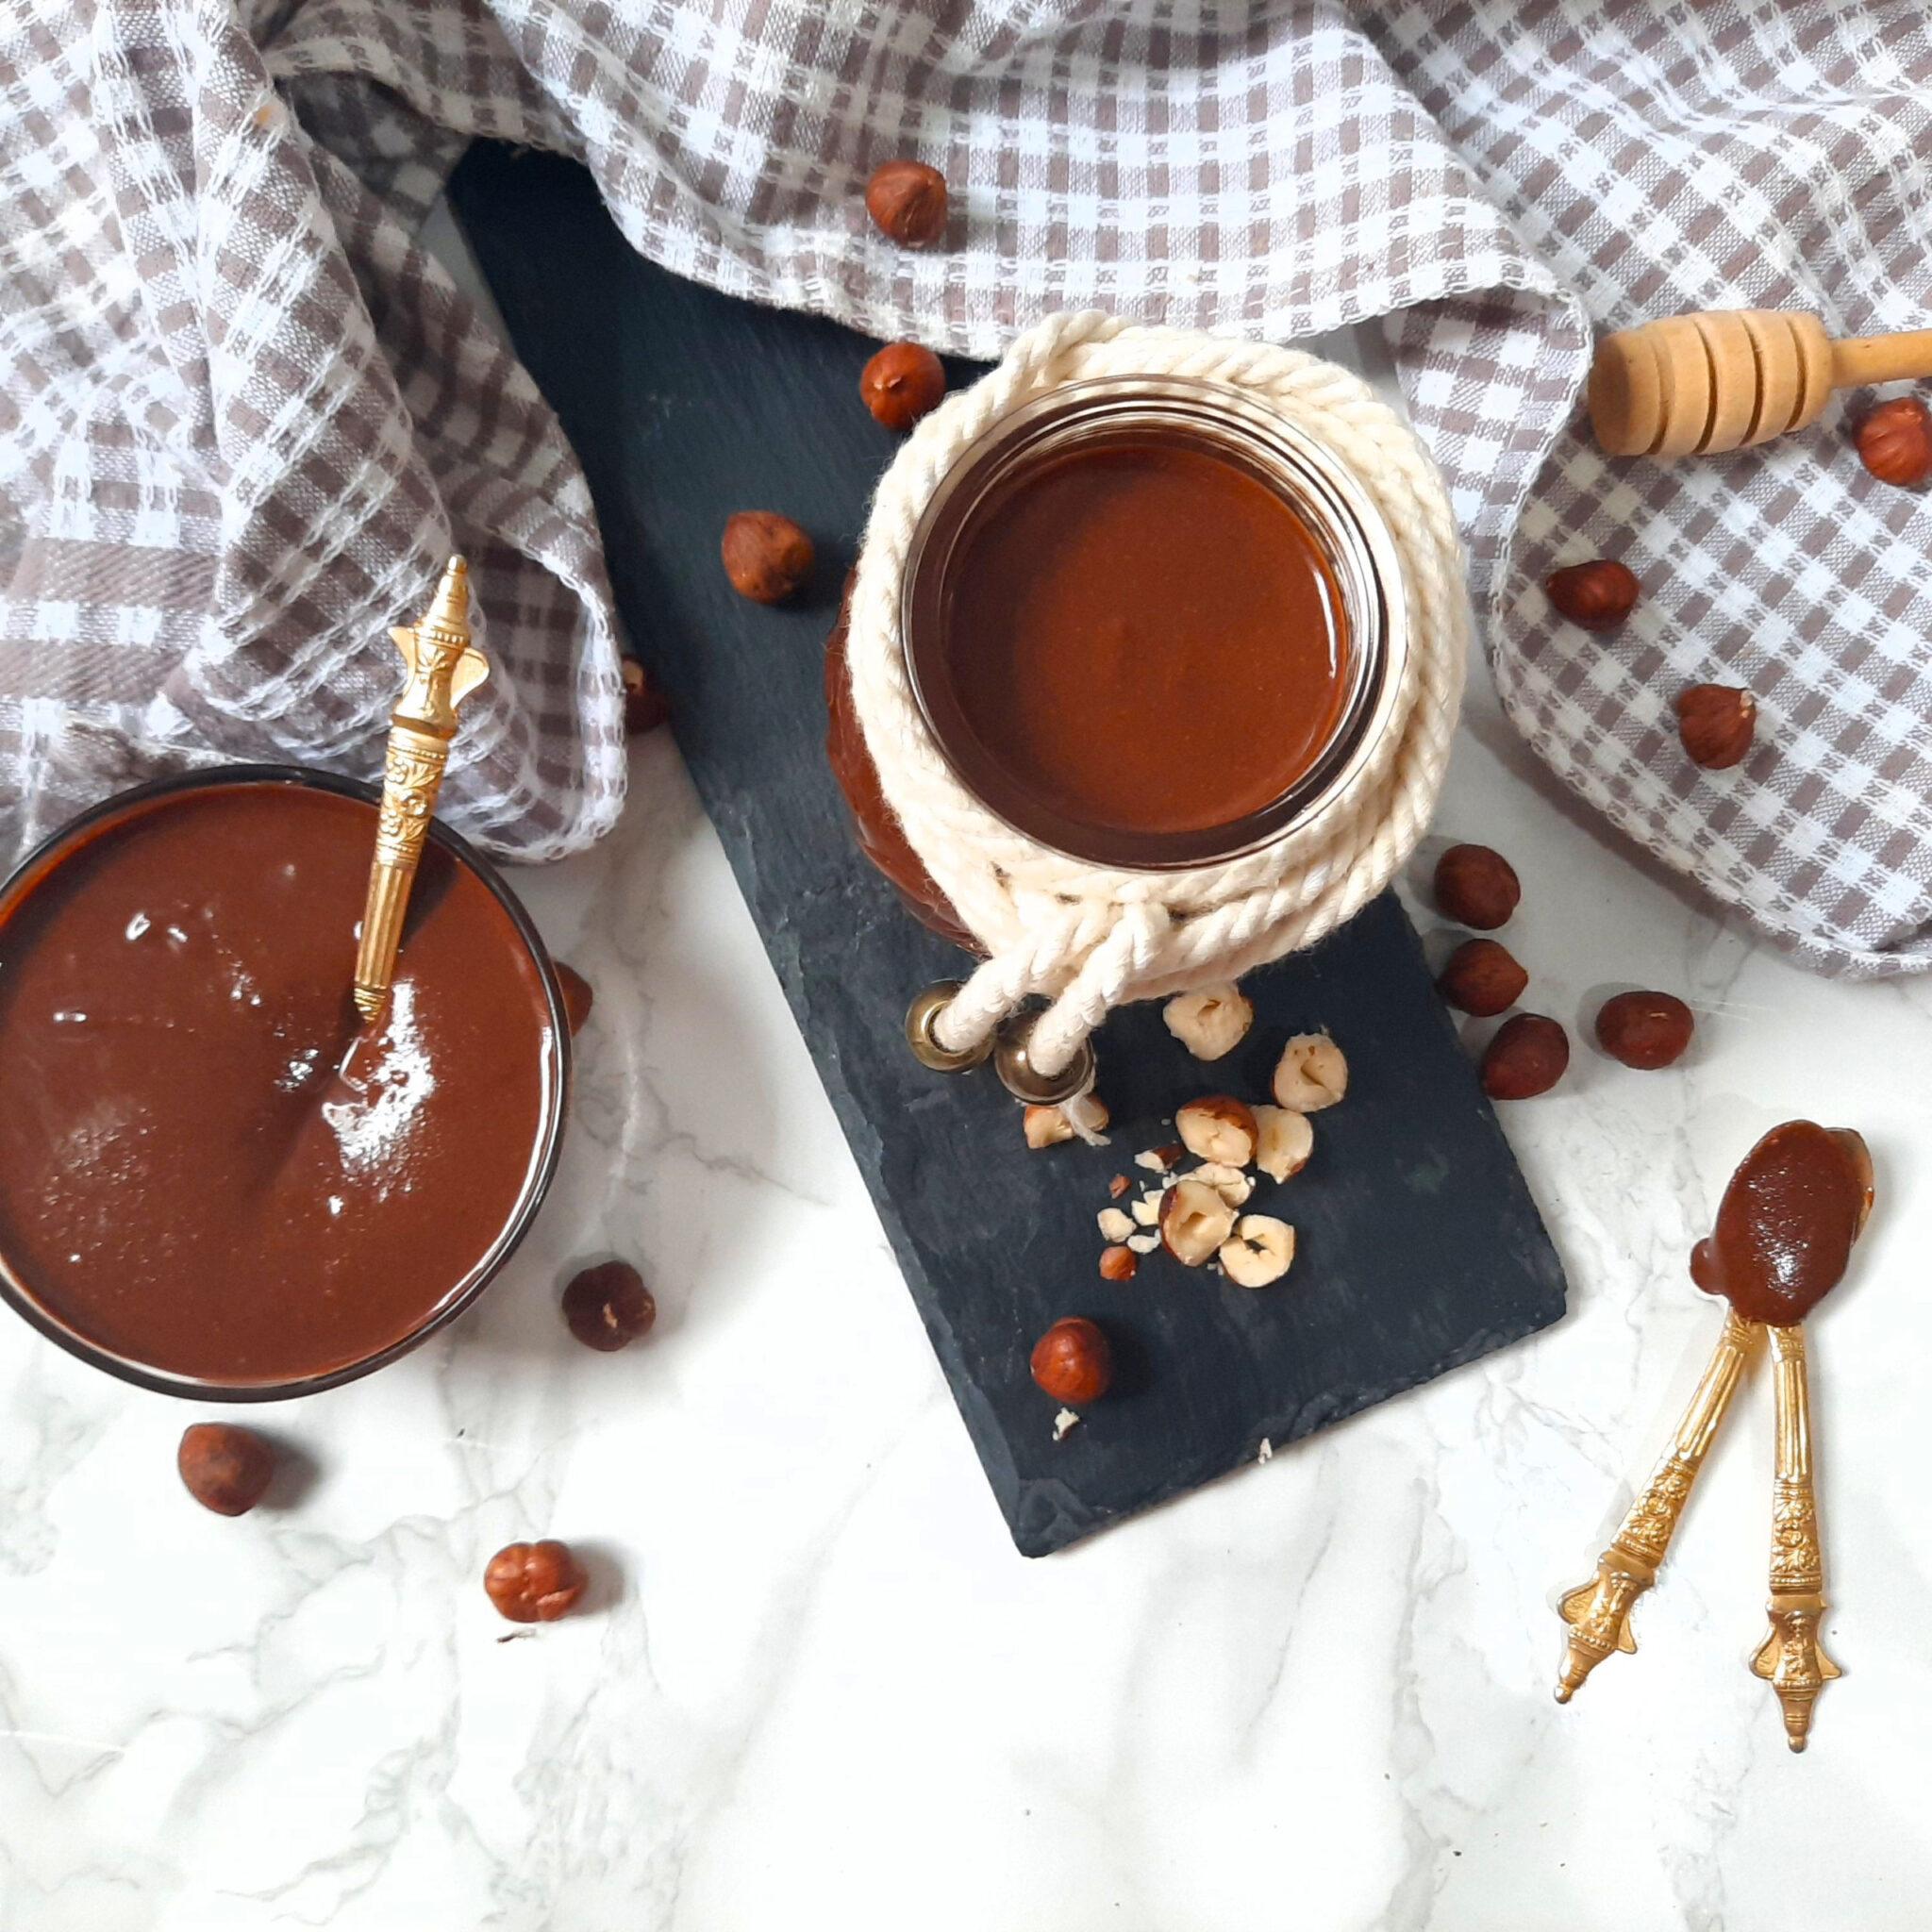 Homemade Nutella: Chocolate Hazelnut Spread